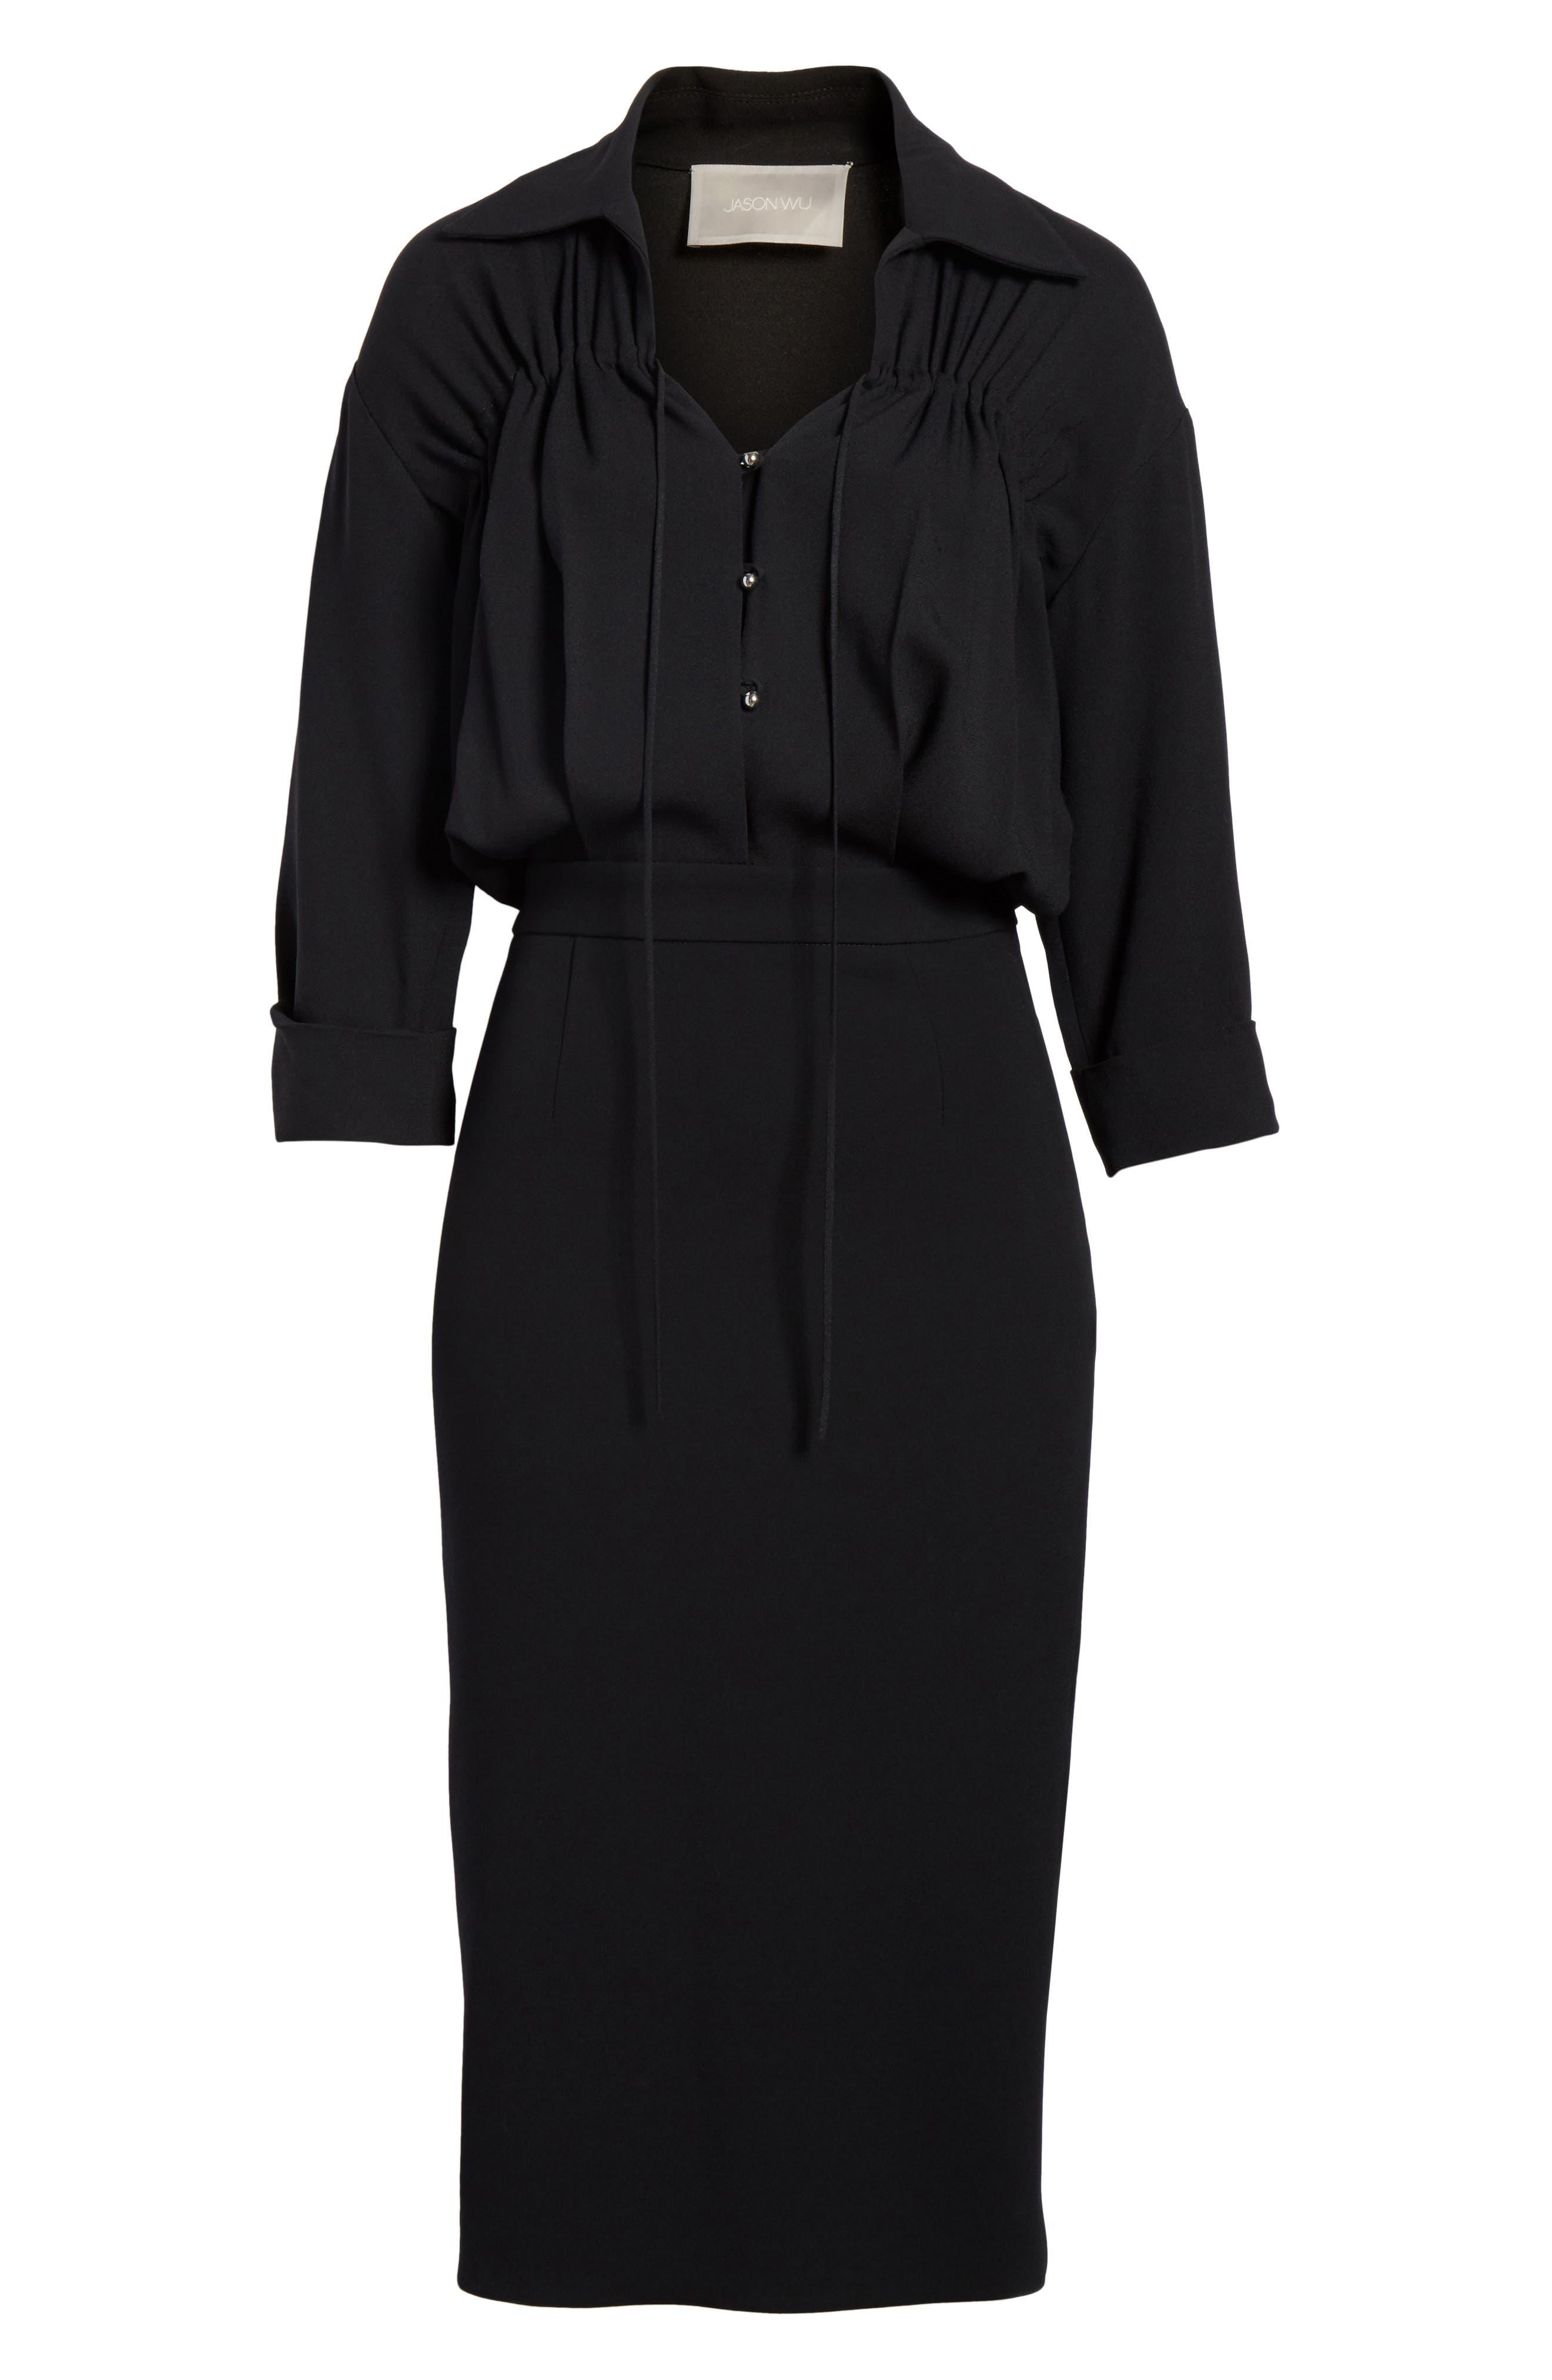 Ruched Blouson Dress,                             Alternate thumbnail 7, color,                             Black